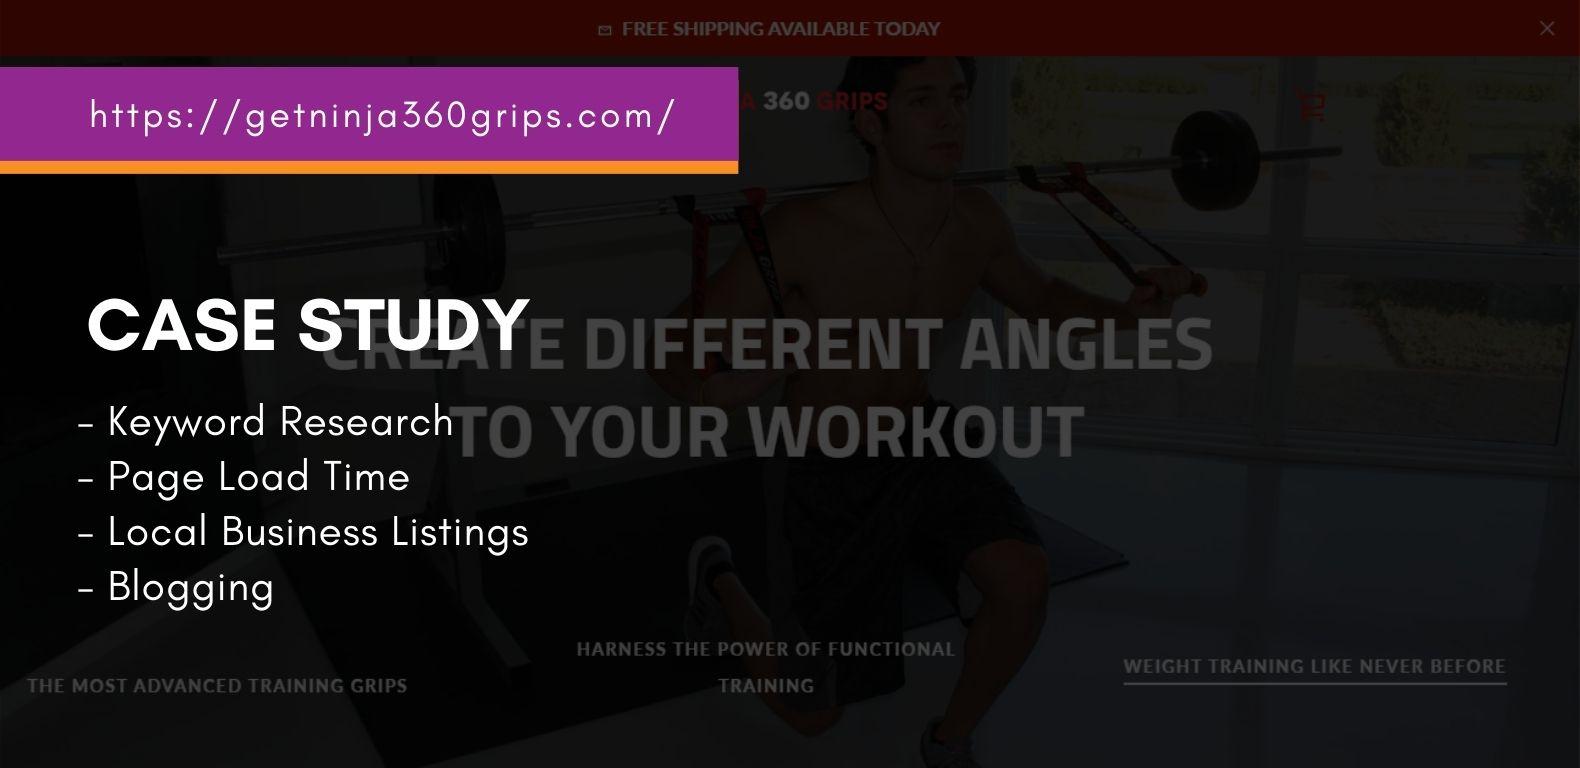 SEO-Ninja-360-Grips-Case-Study